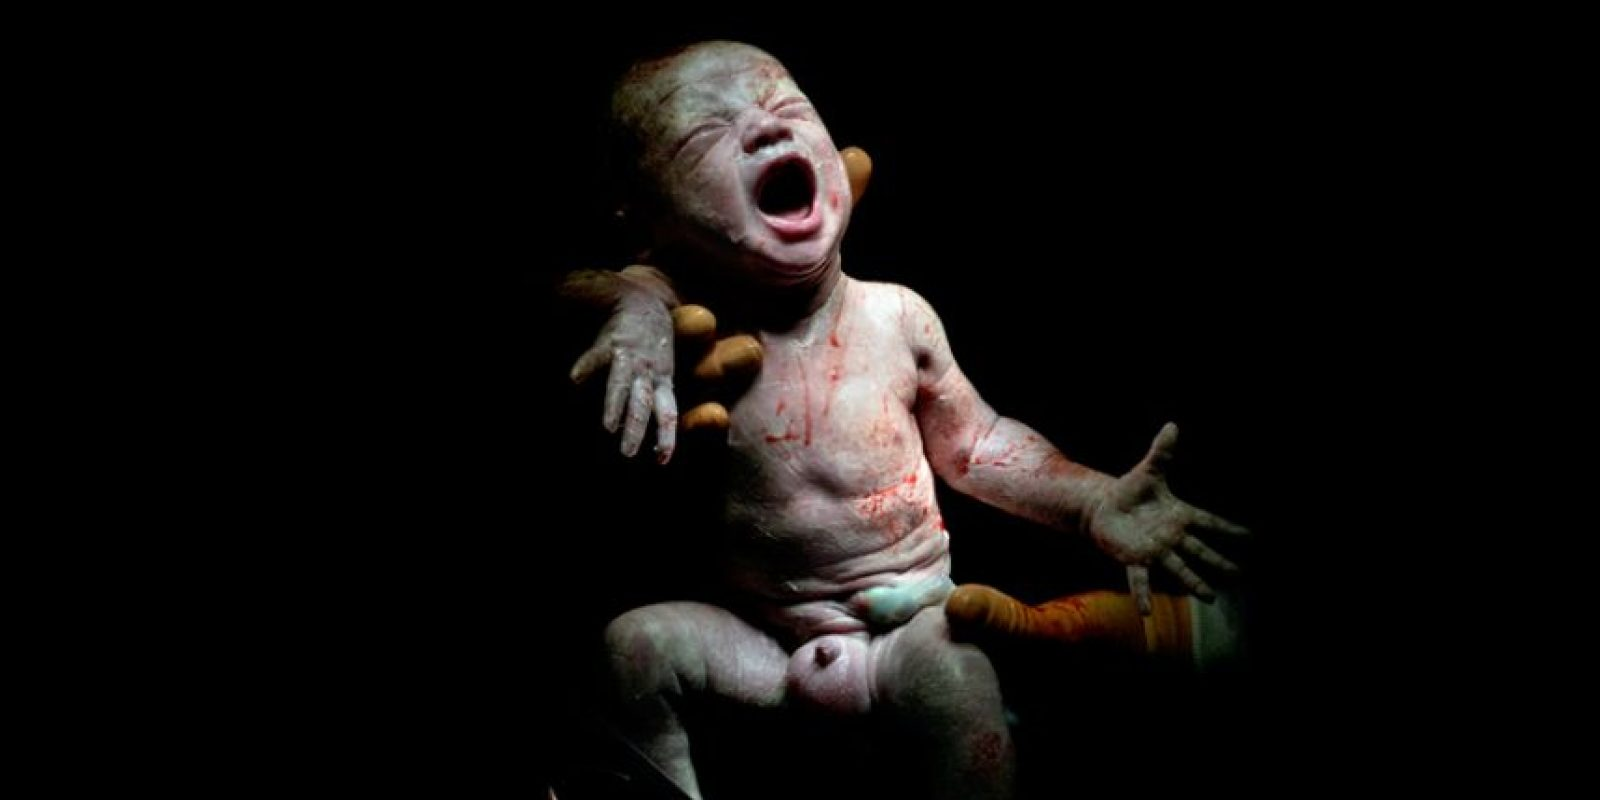 Nacido diciembre 13, 2013 a las 4:52 p.m. 2kg 800 – 18 segundos de vida Foto:Christian Berthelot